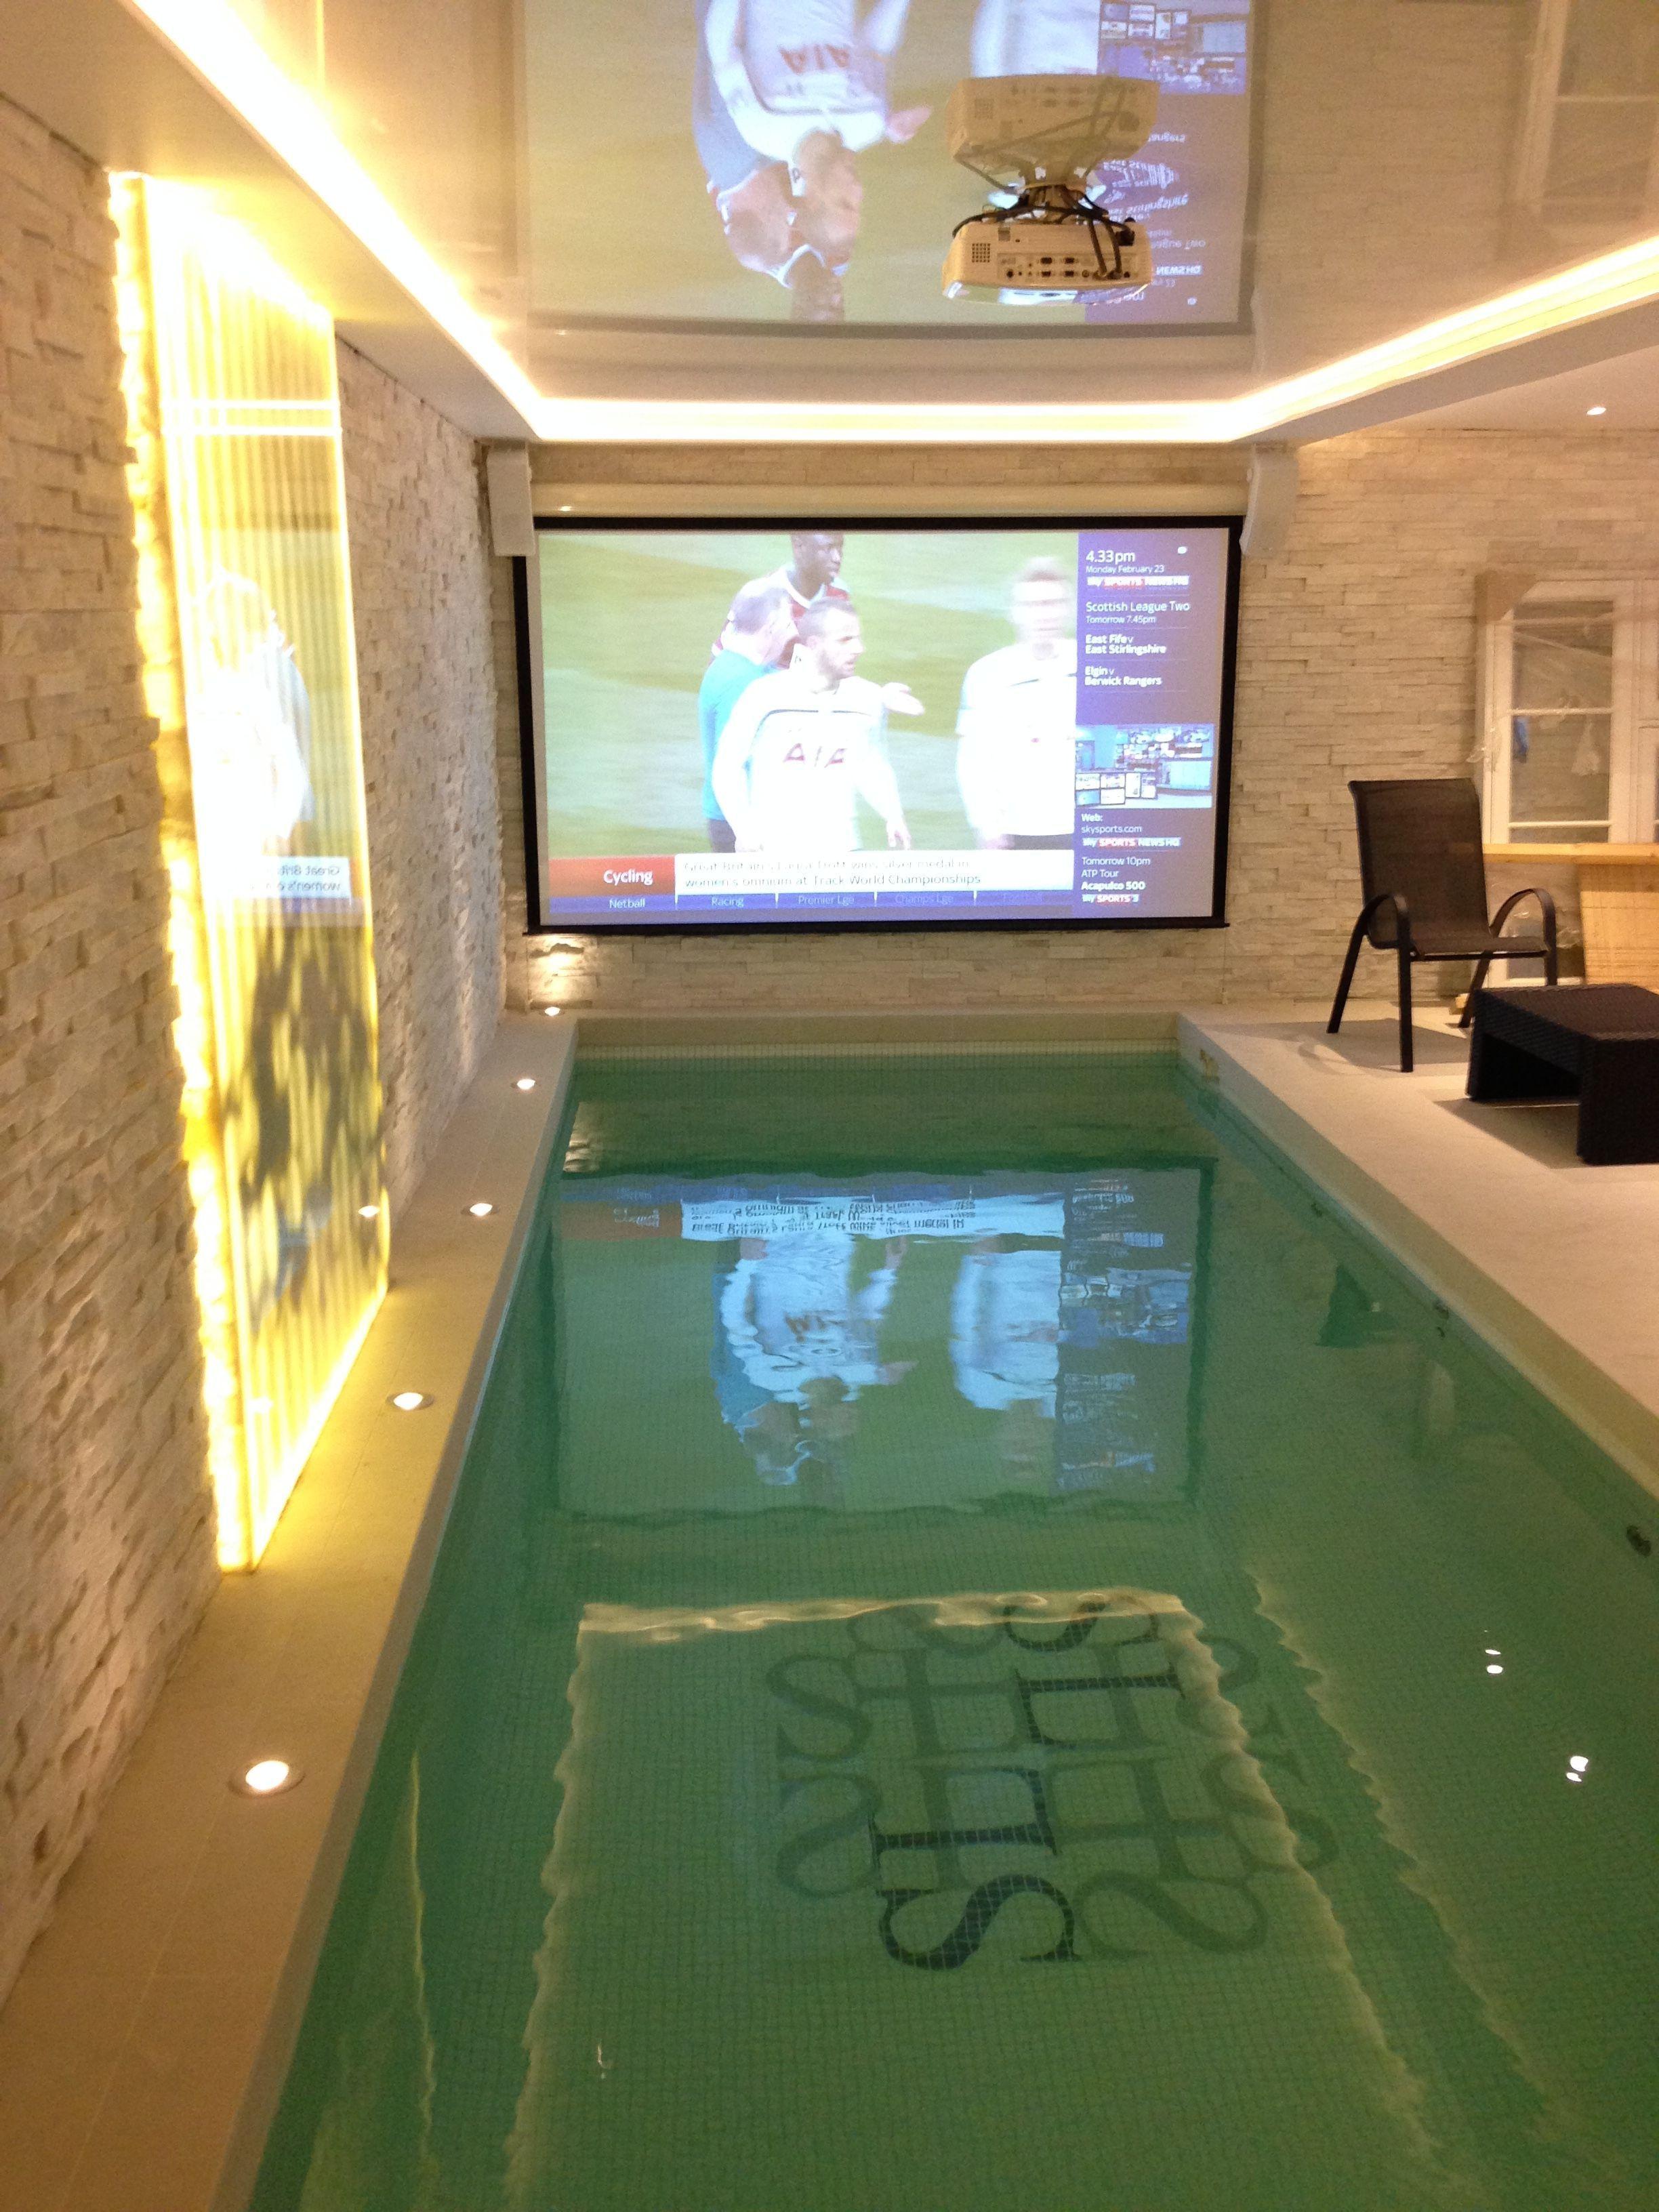 Luxury Basement Pool In London Swimmingpool Indoorpool Smallpools Indoorswimmingpoo Indoor Swimming Pool Design Swimming Pool House Luxury Swimming Pools